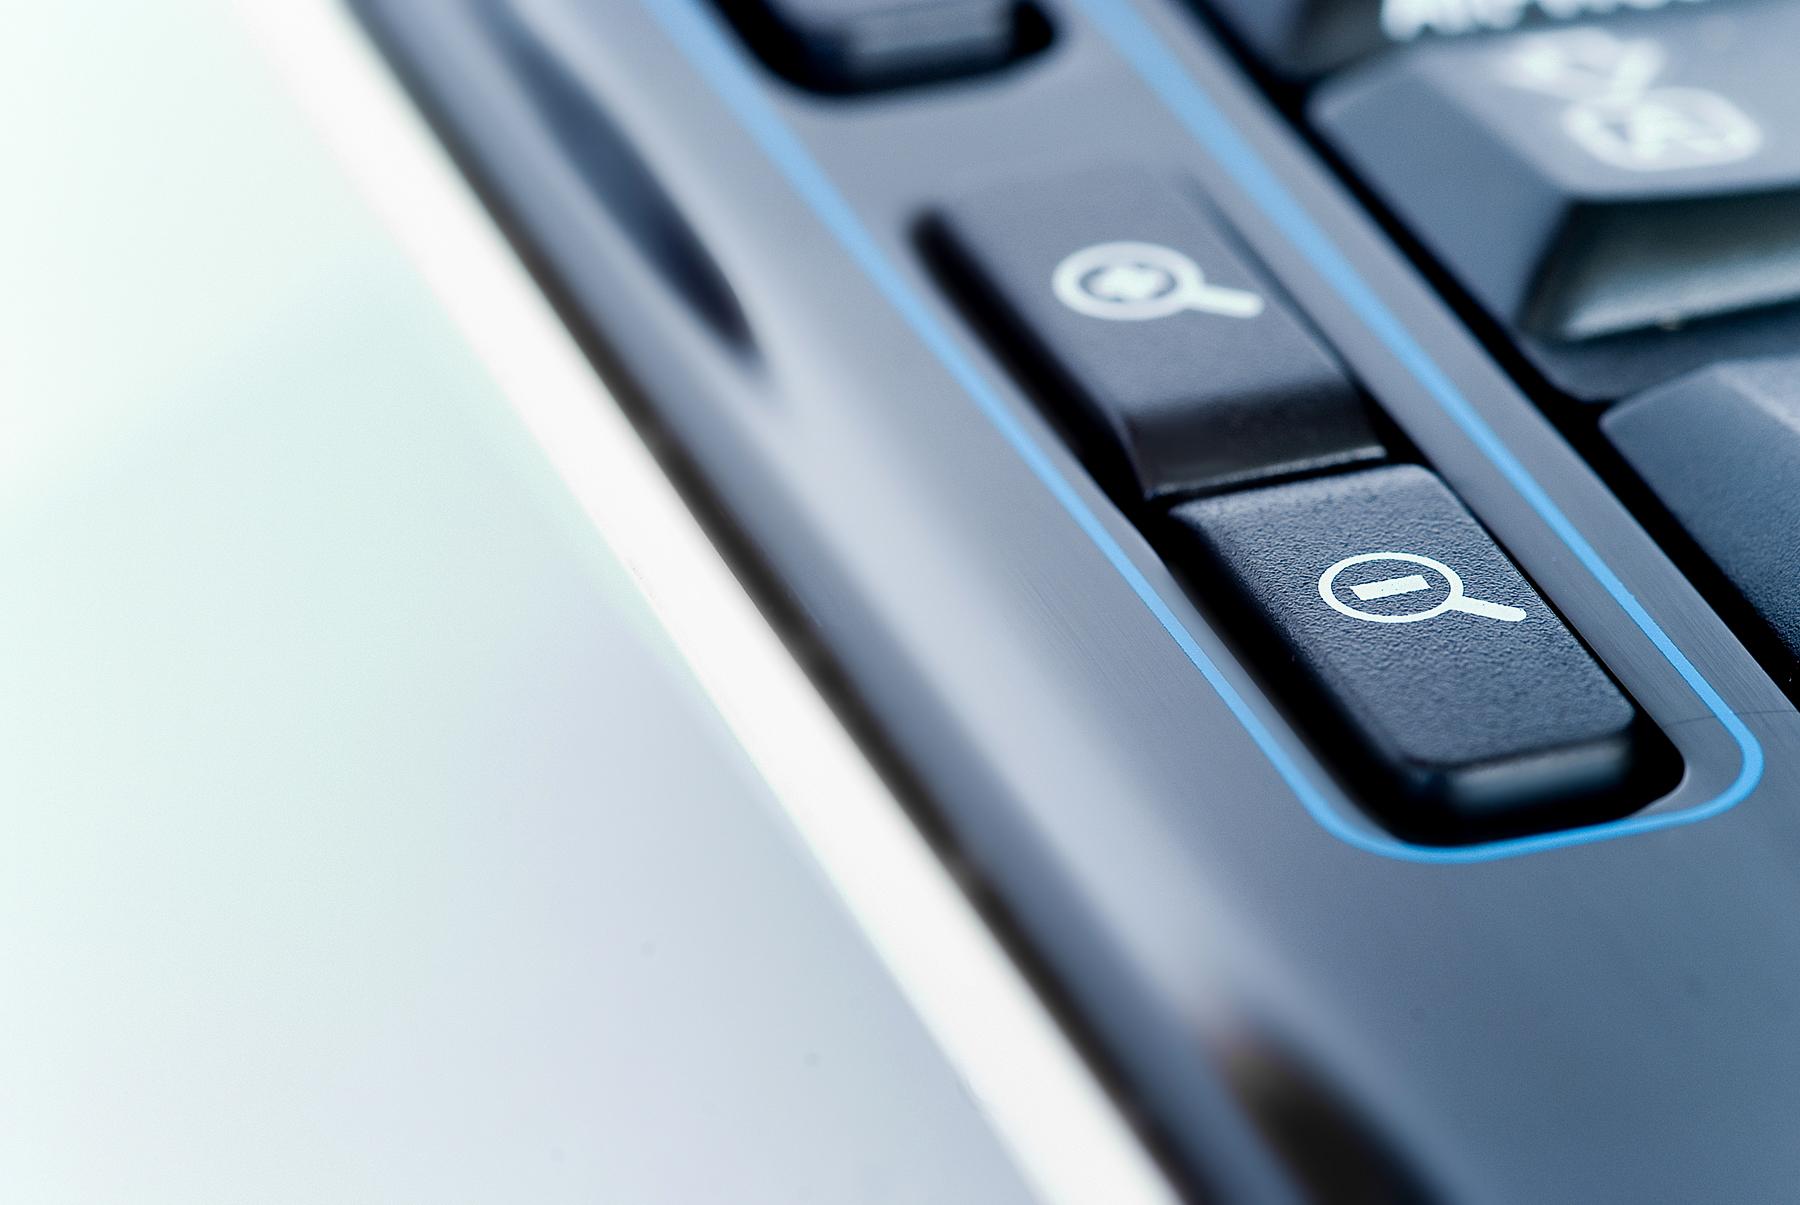 Tastatur_Usability01